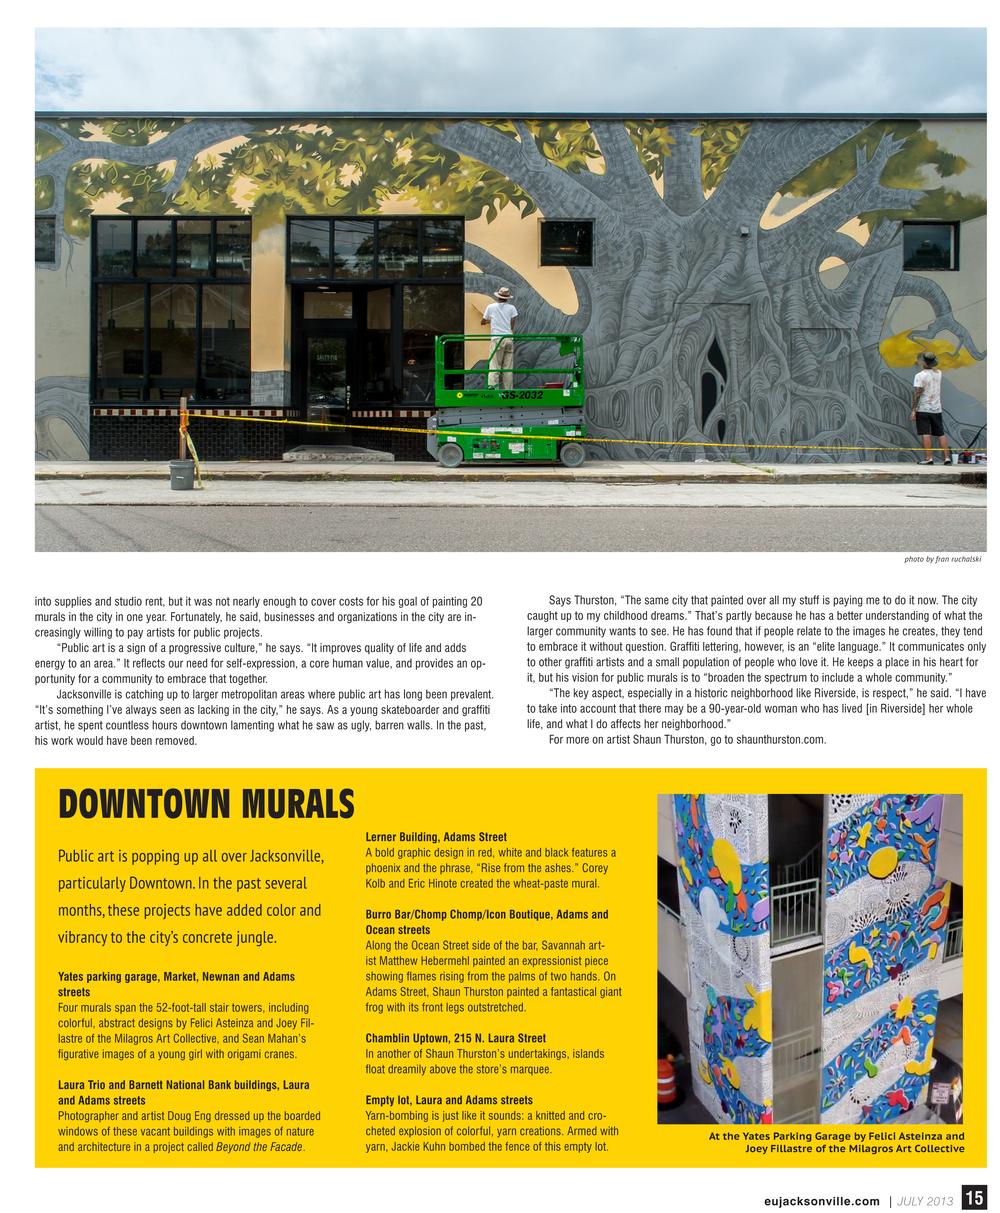 EUJ_July13_Page 14-15-2.jpg